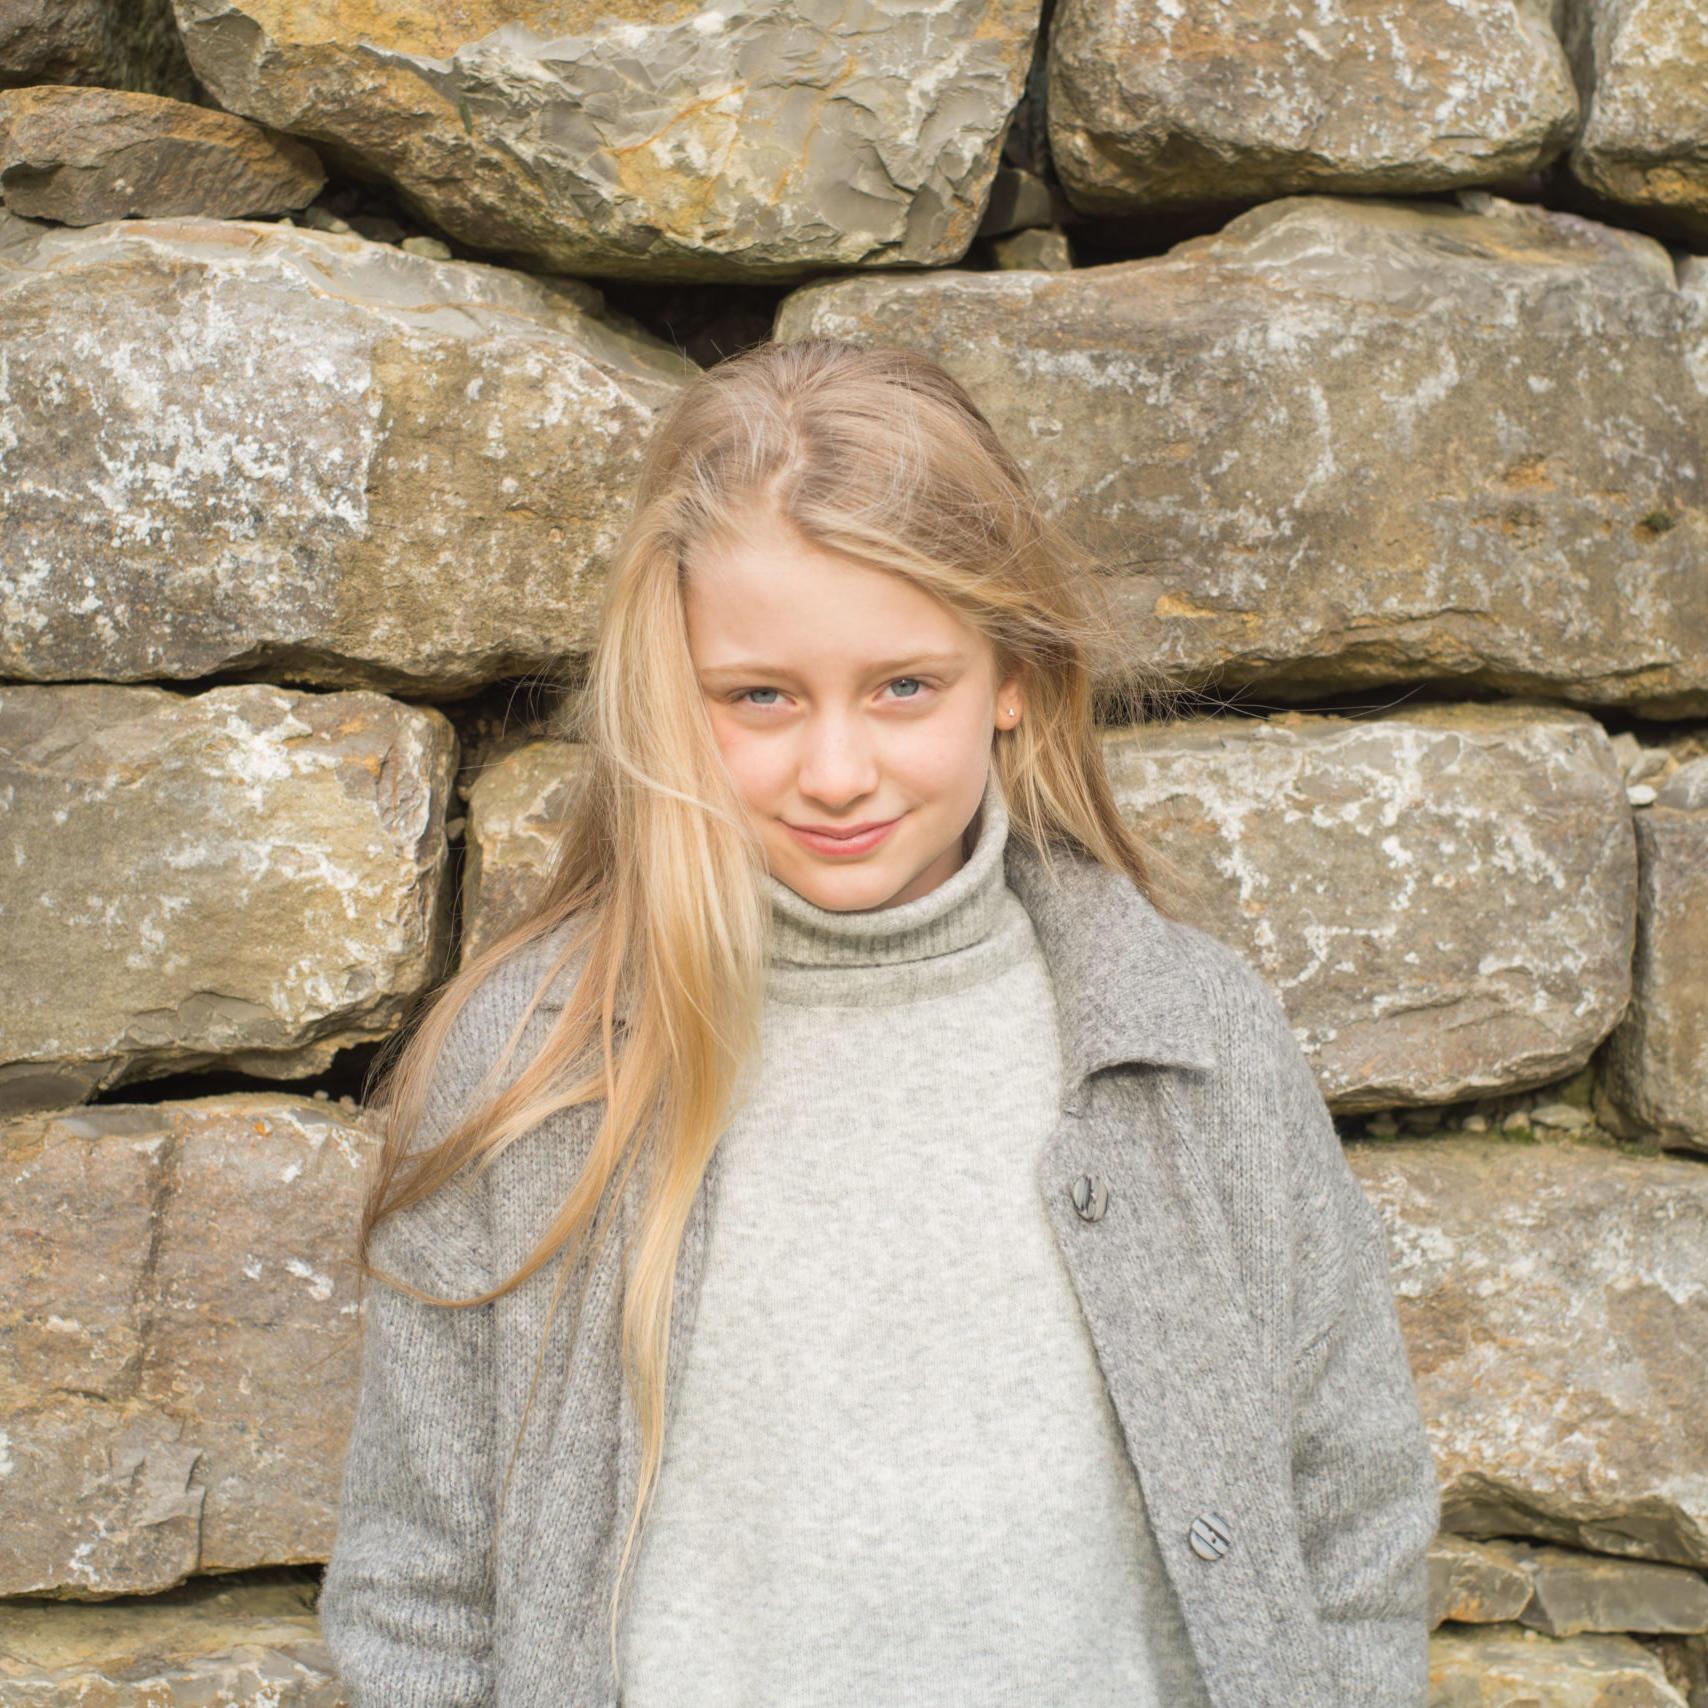 Cassidy Rochford